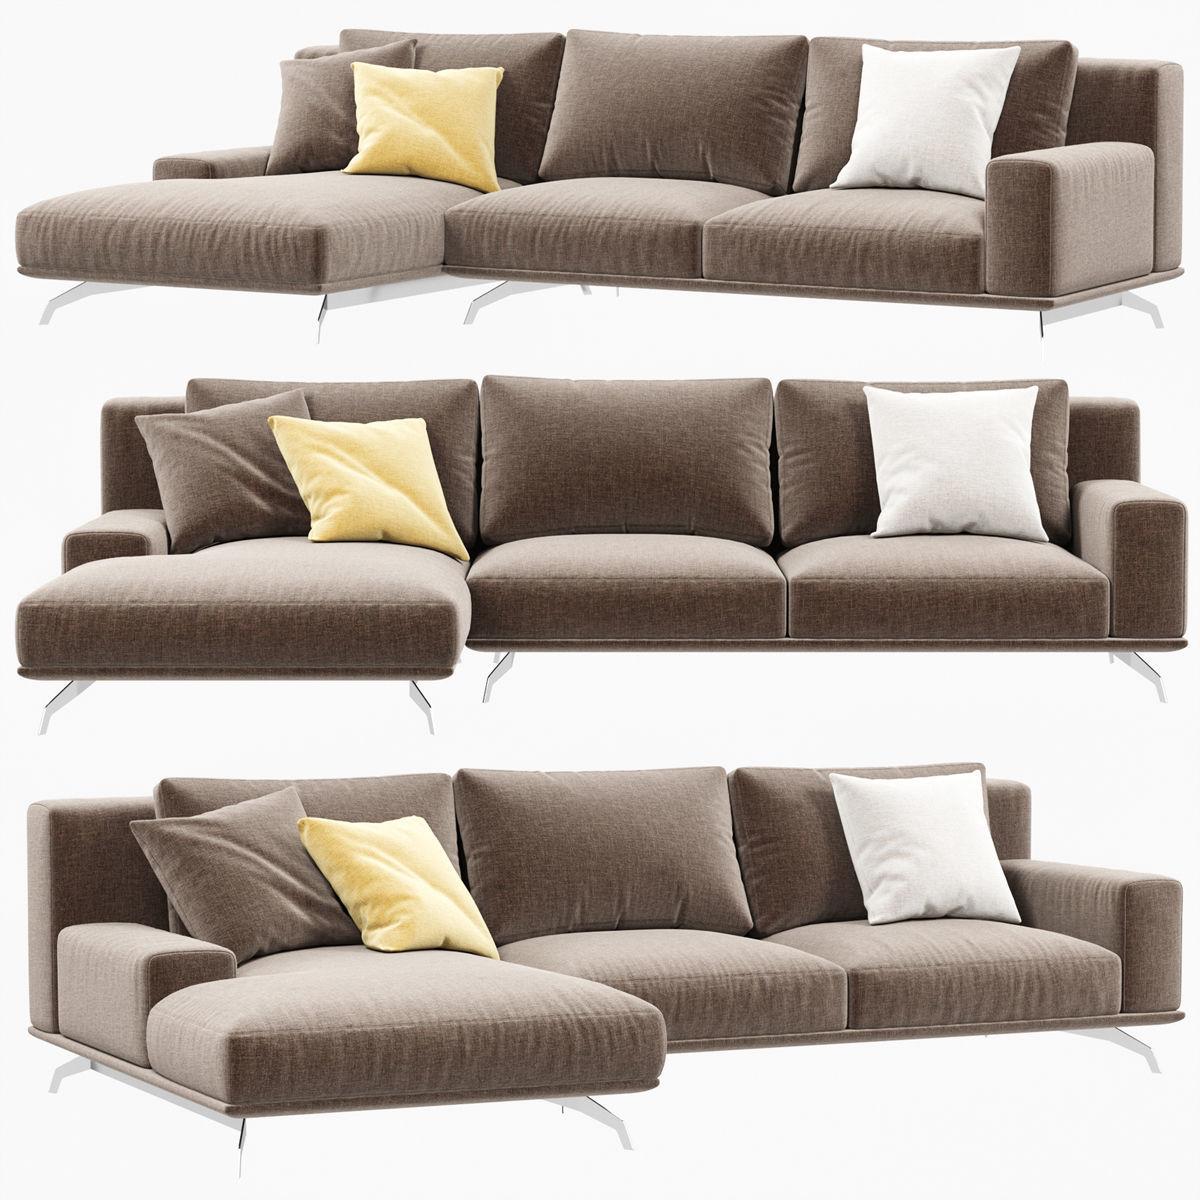 dalton sofa bed mart grand rapids mi 3d model ditreitalia cgtrader